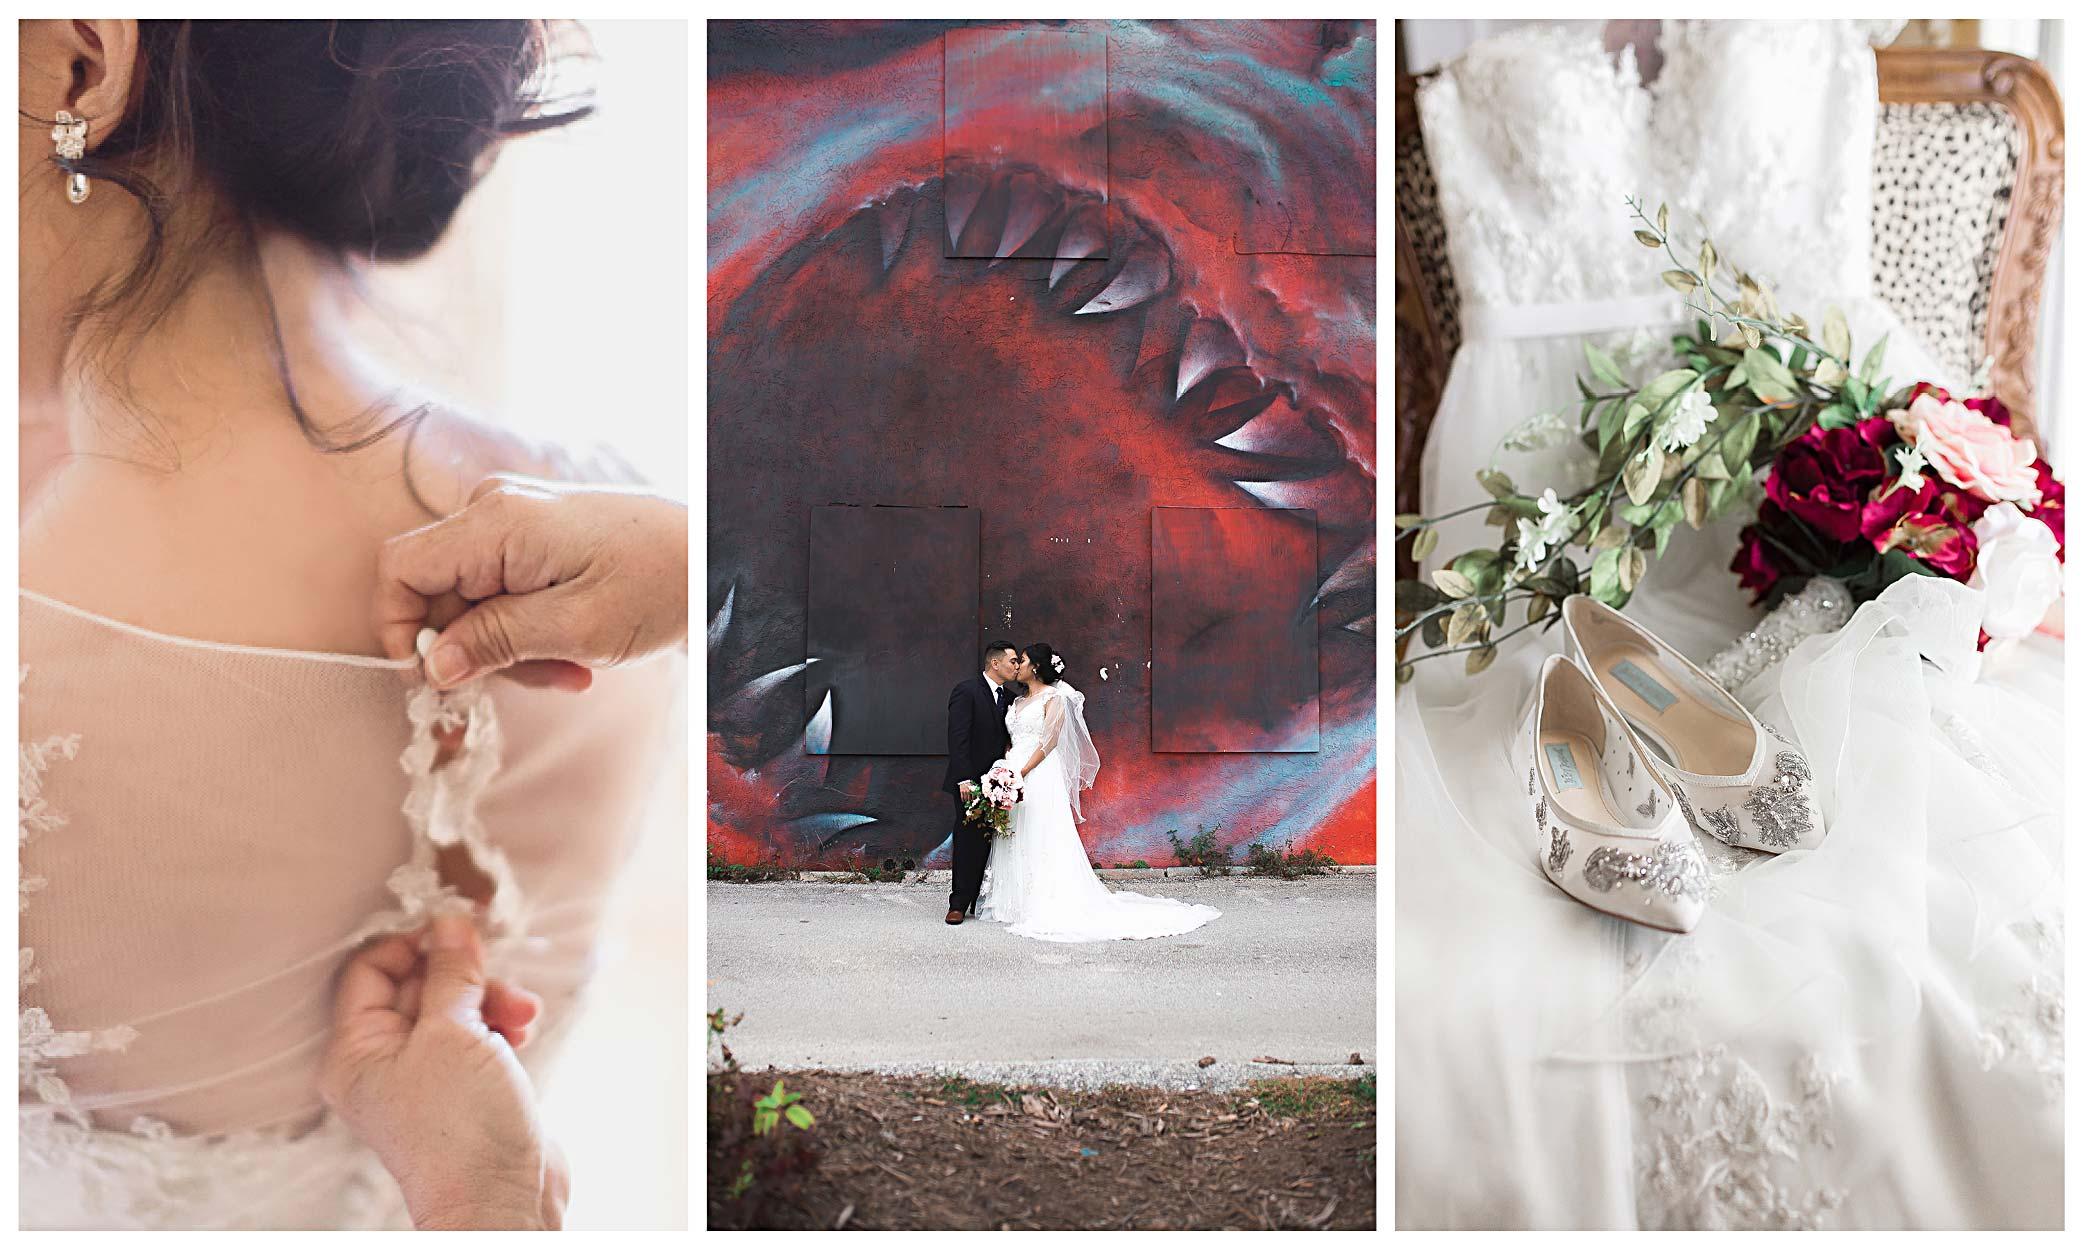 eau gallie arts district filipino wedding photos